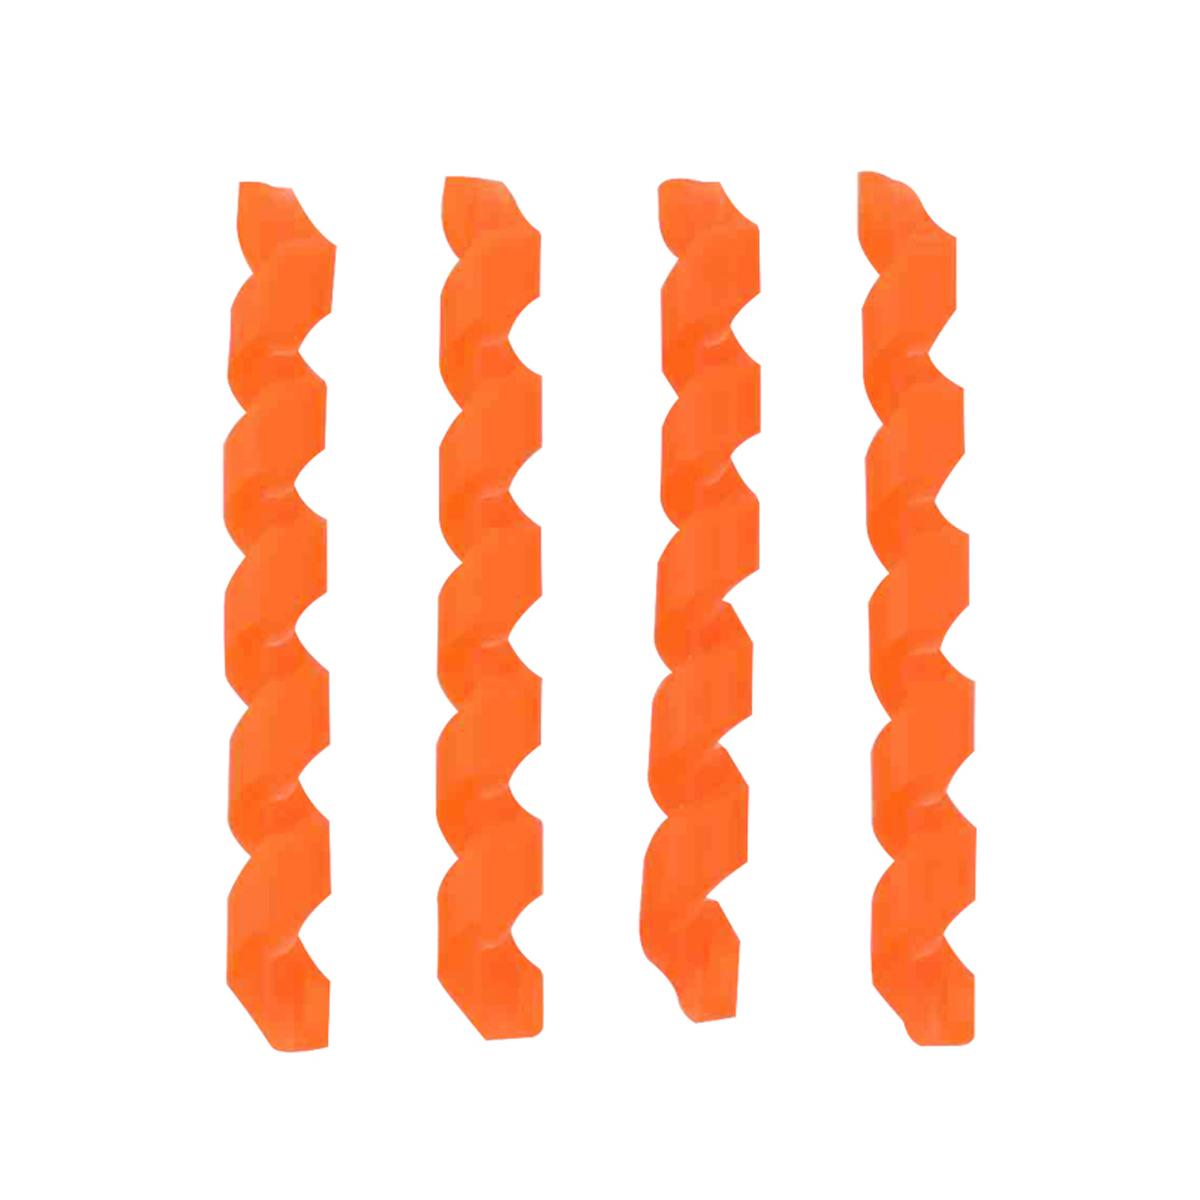 NOGUCHI ( ノグチ ) フレームプロテクター 蛍光 オレンジ